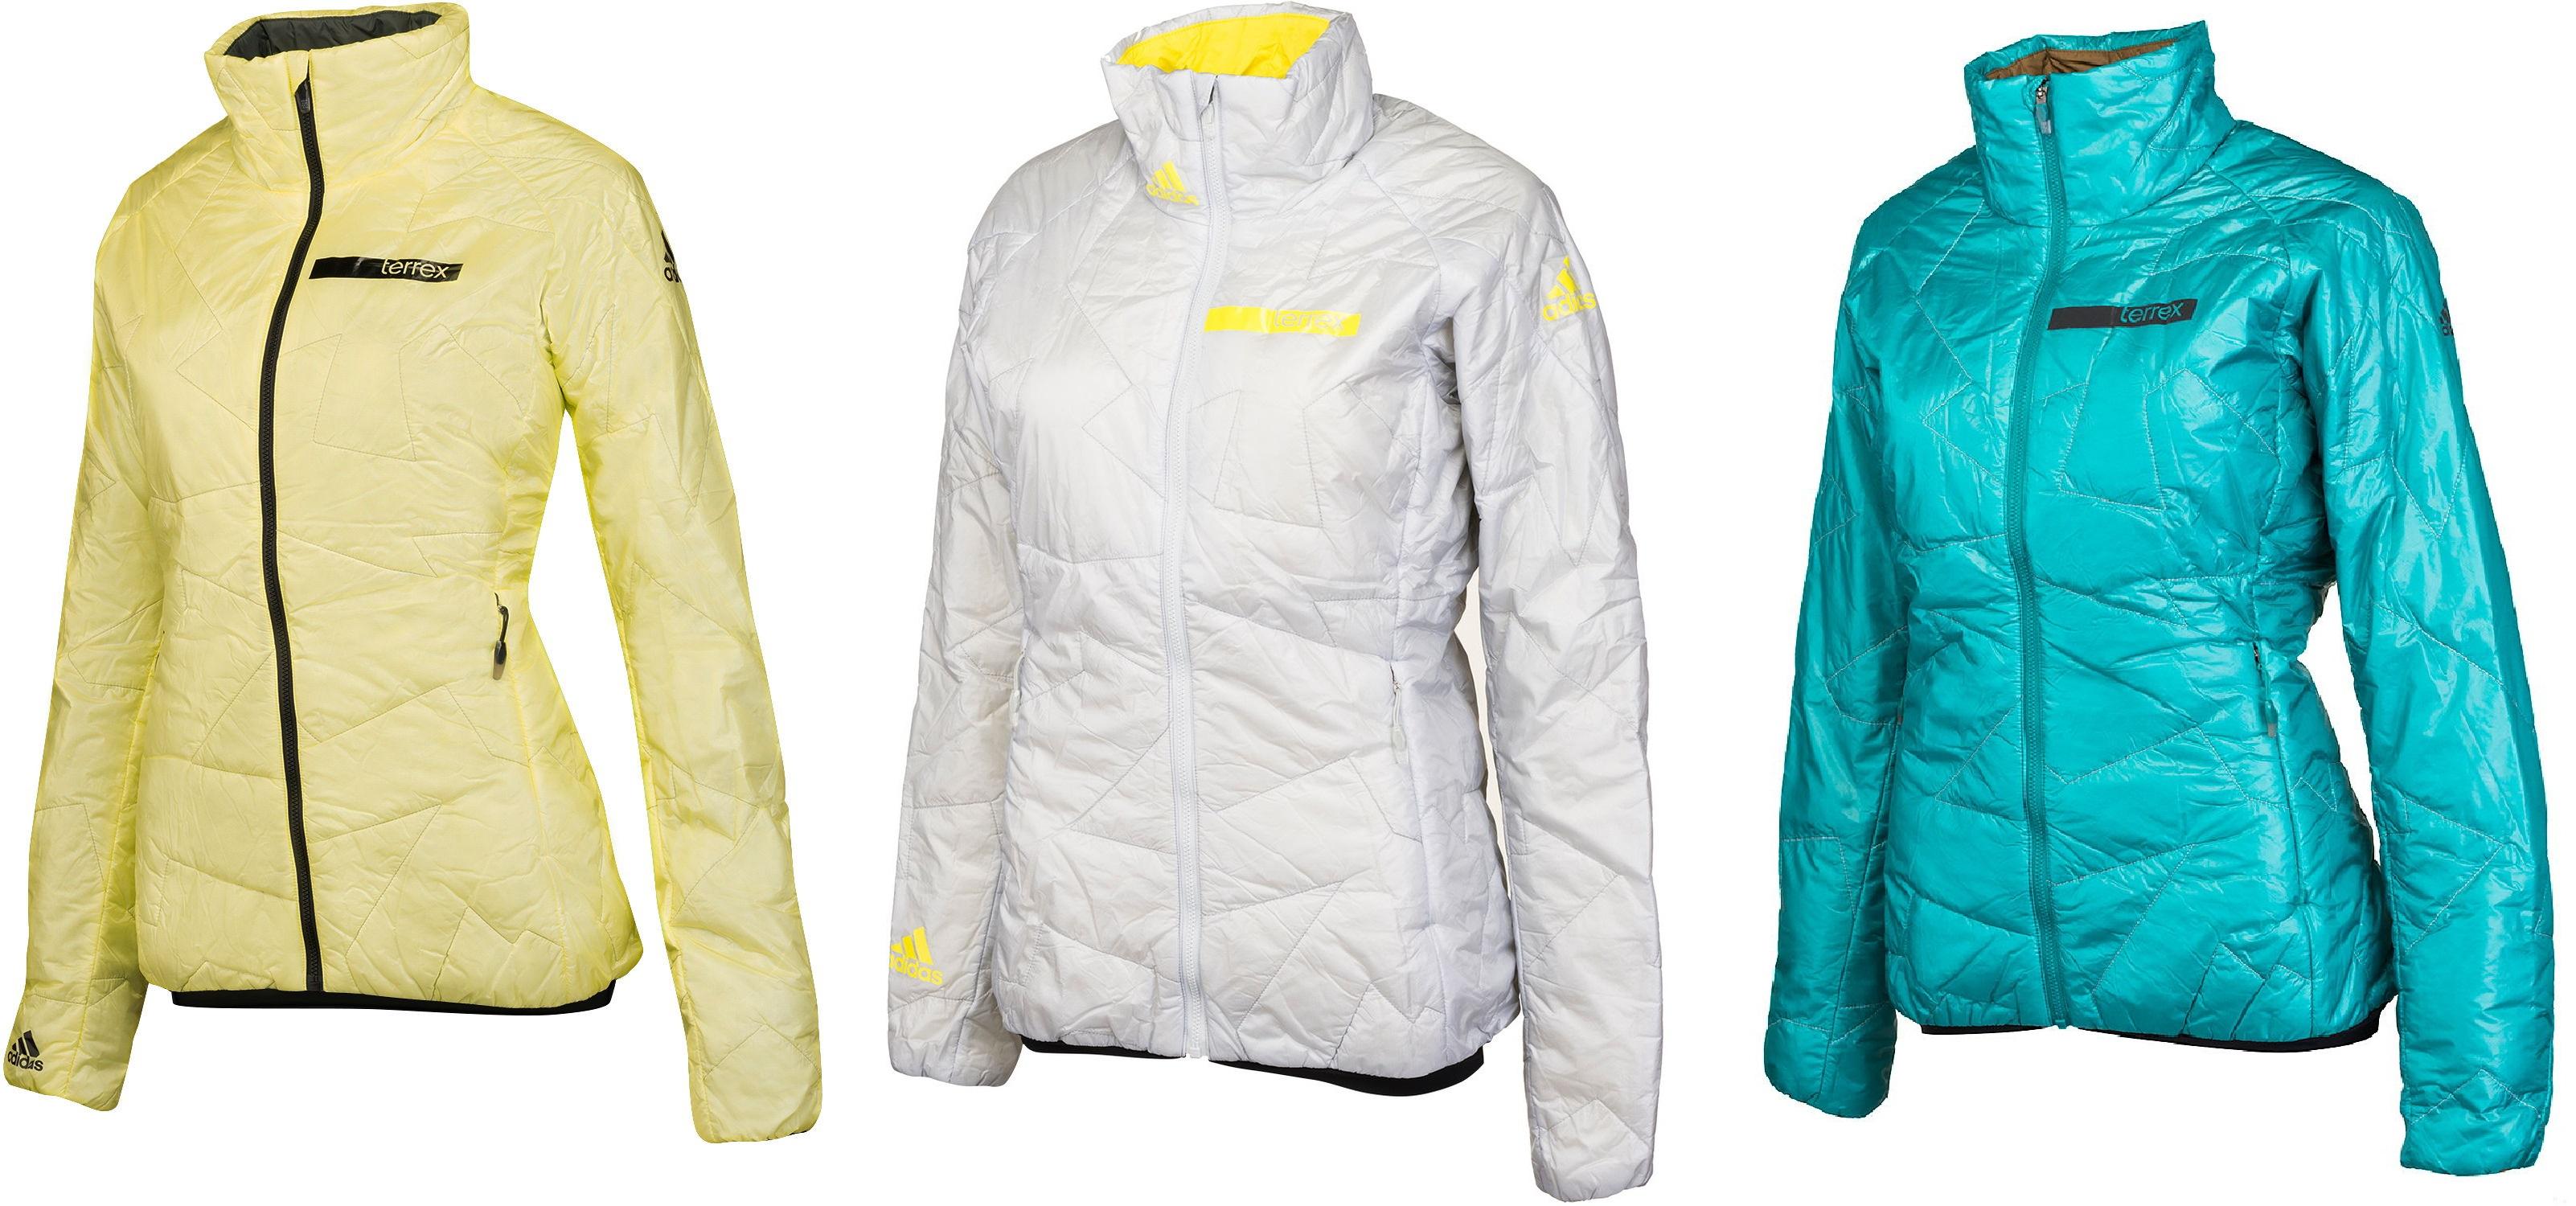 Adidas Terrex Agravic PrimaLoft kurtka damska, 3 kolory